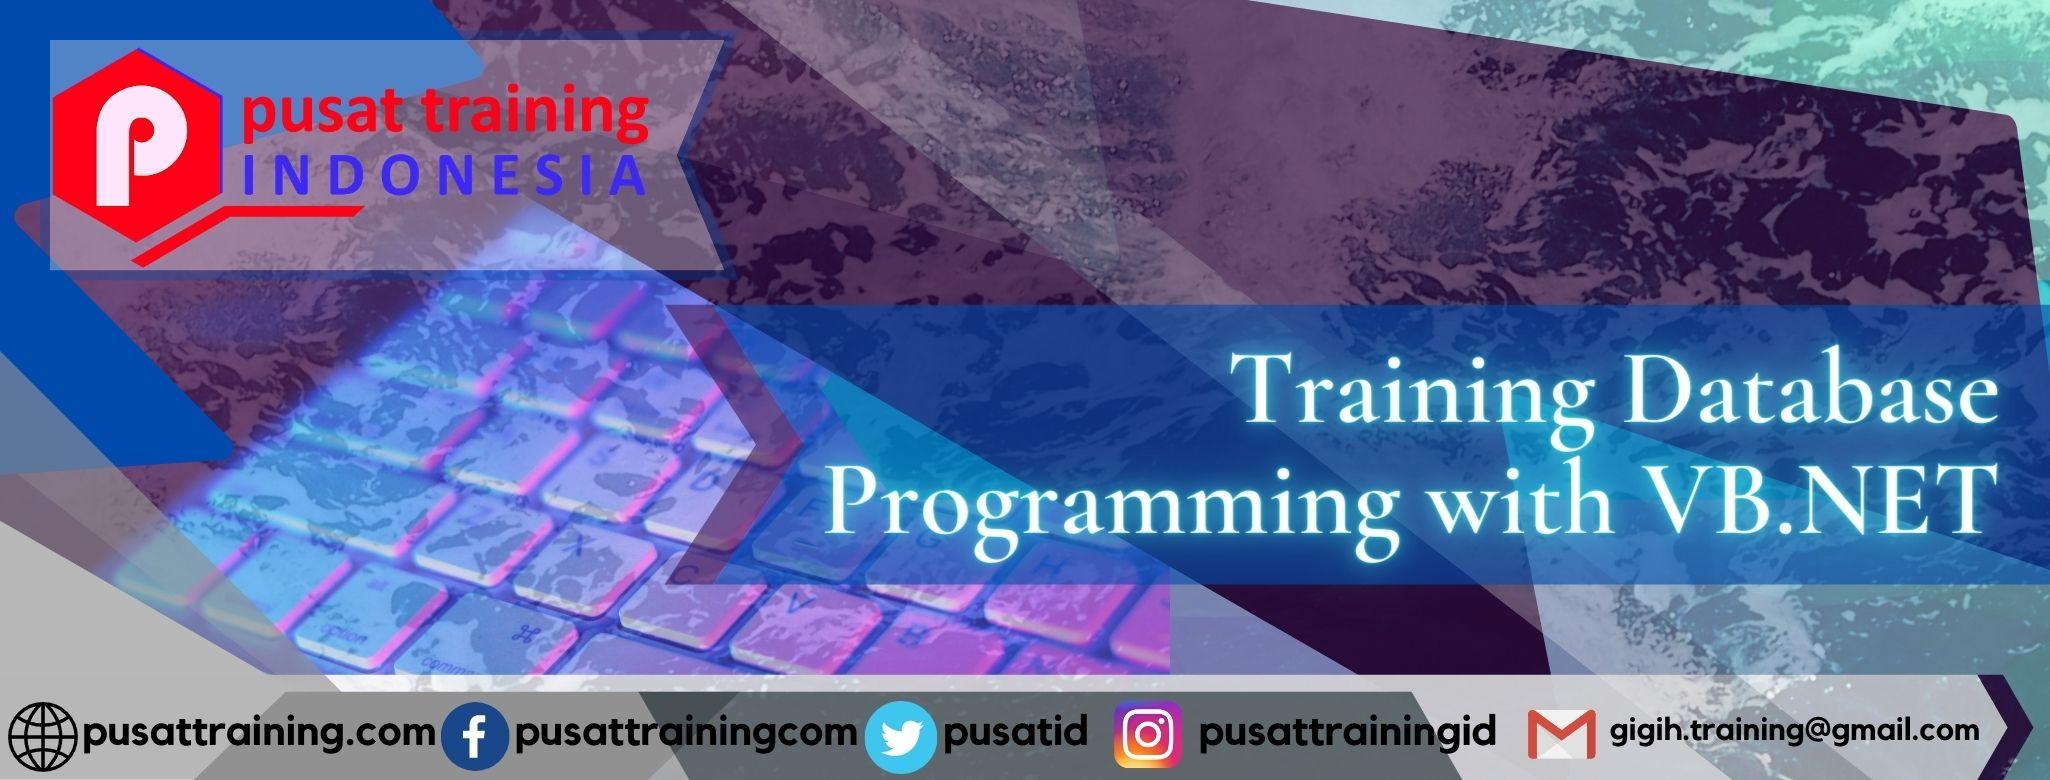 Training Database Programming with VB.NET